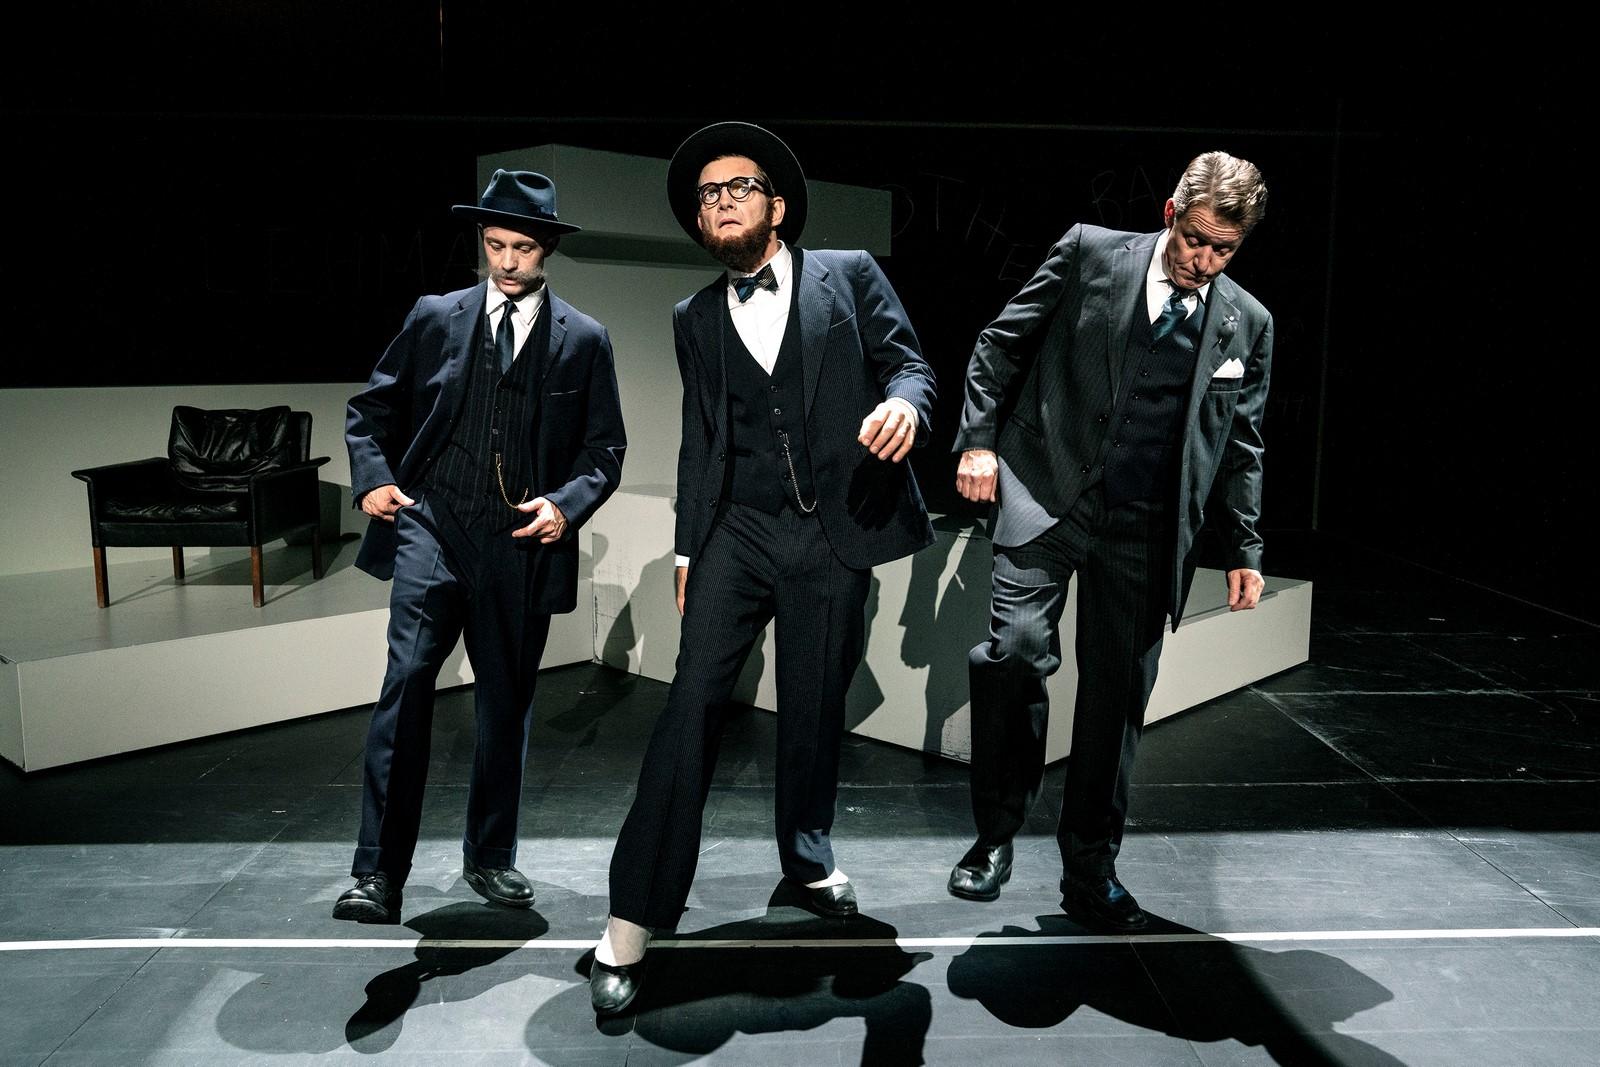 Anmeldelse: Lehman Brothers, Teater Republique